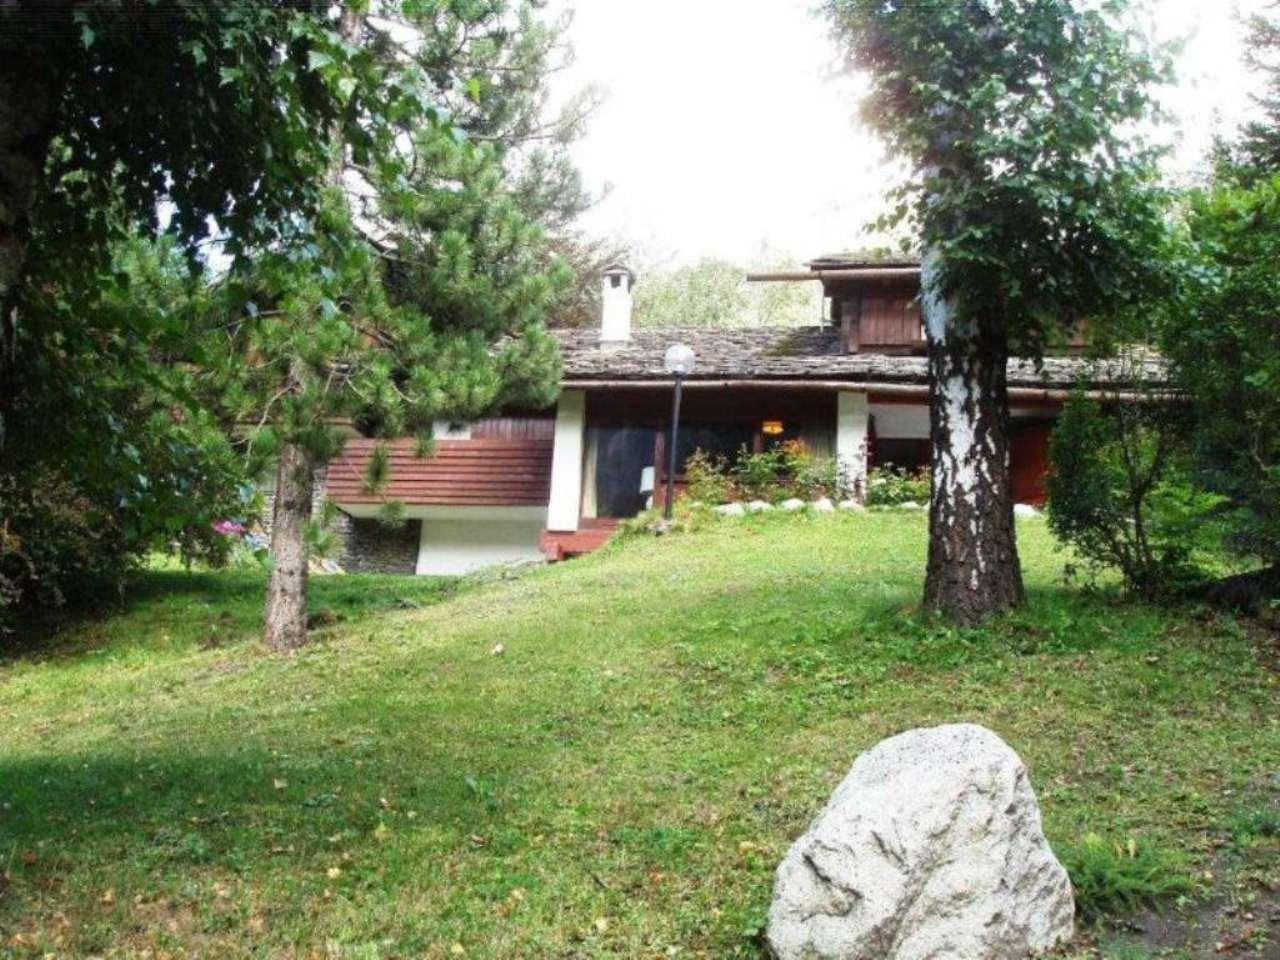 Villa in Vendita a Courmayeur: 5 locali, 220 mq - Foto 2